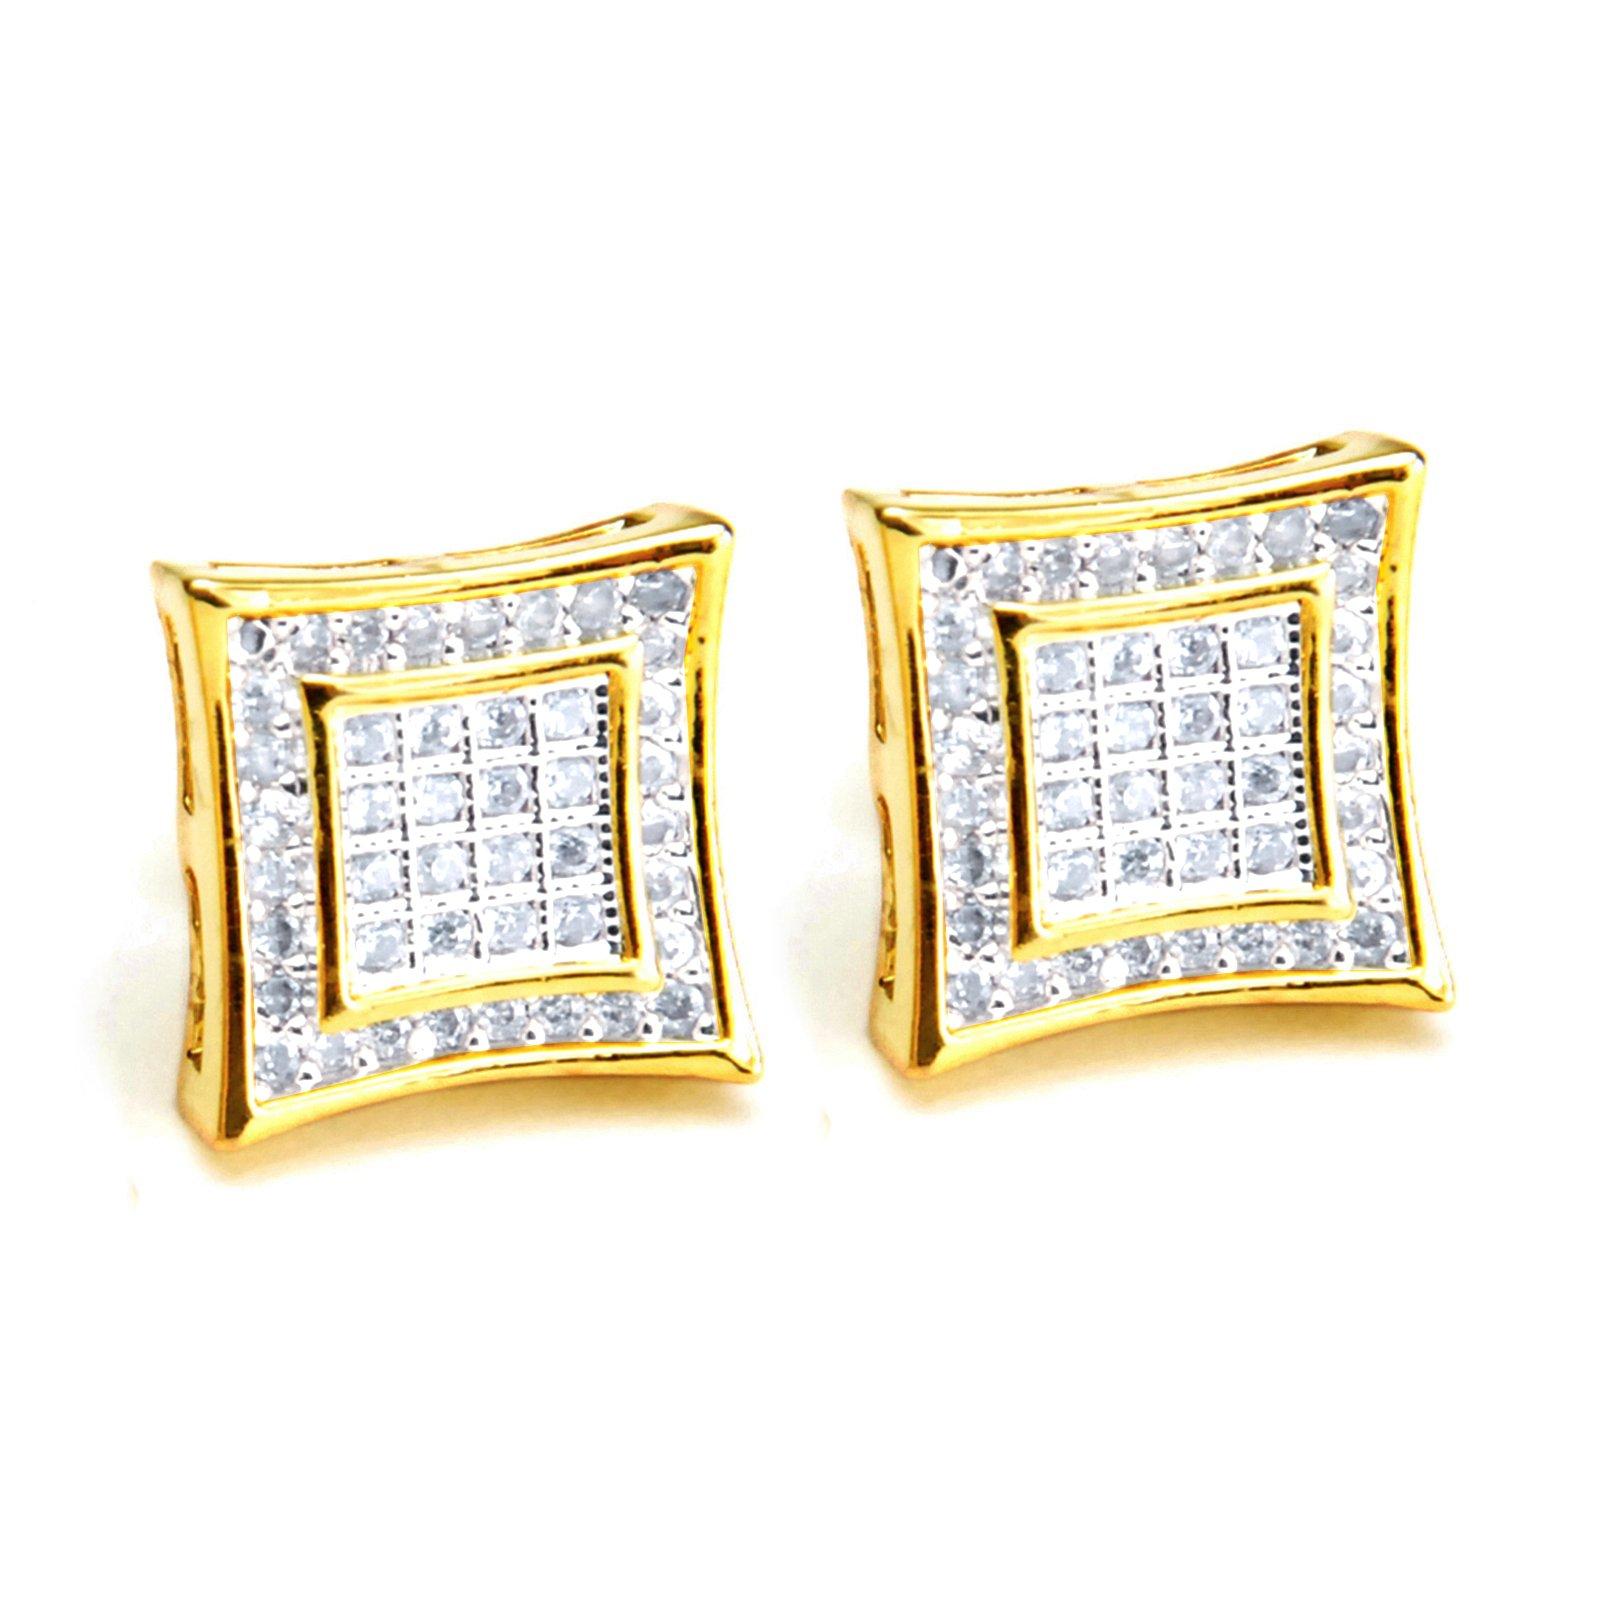 NEW Men's 14K Gold Plated Double Square Kite 2 Tone Screw Back Stud Earring BE 002 TT